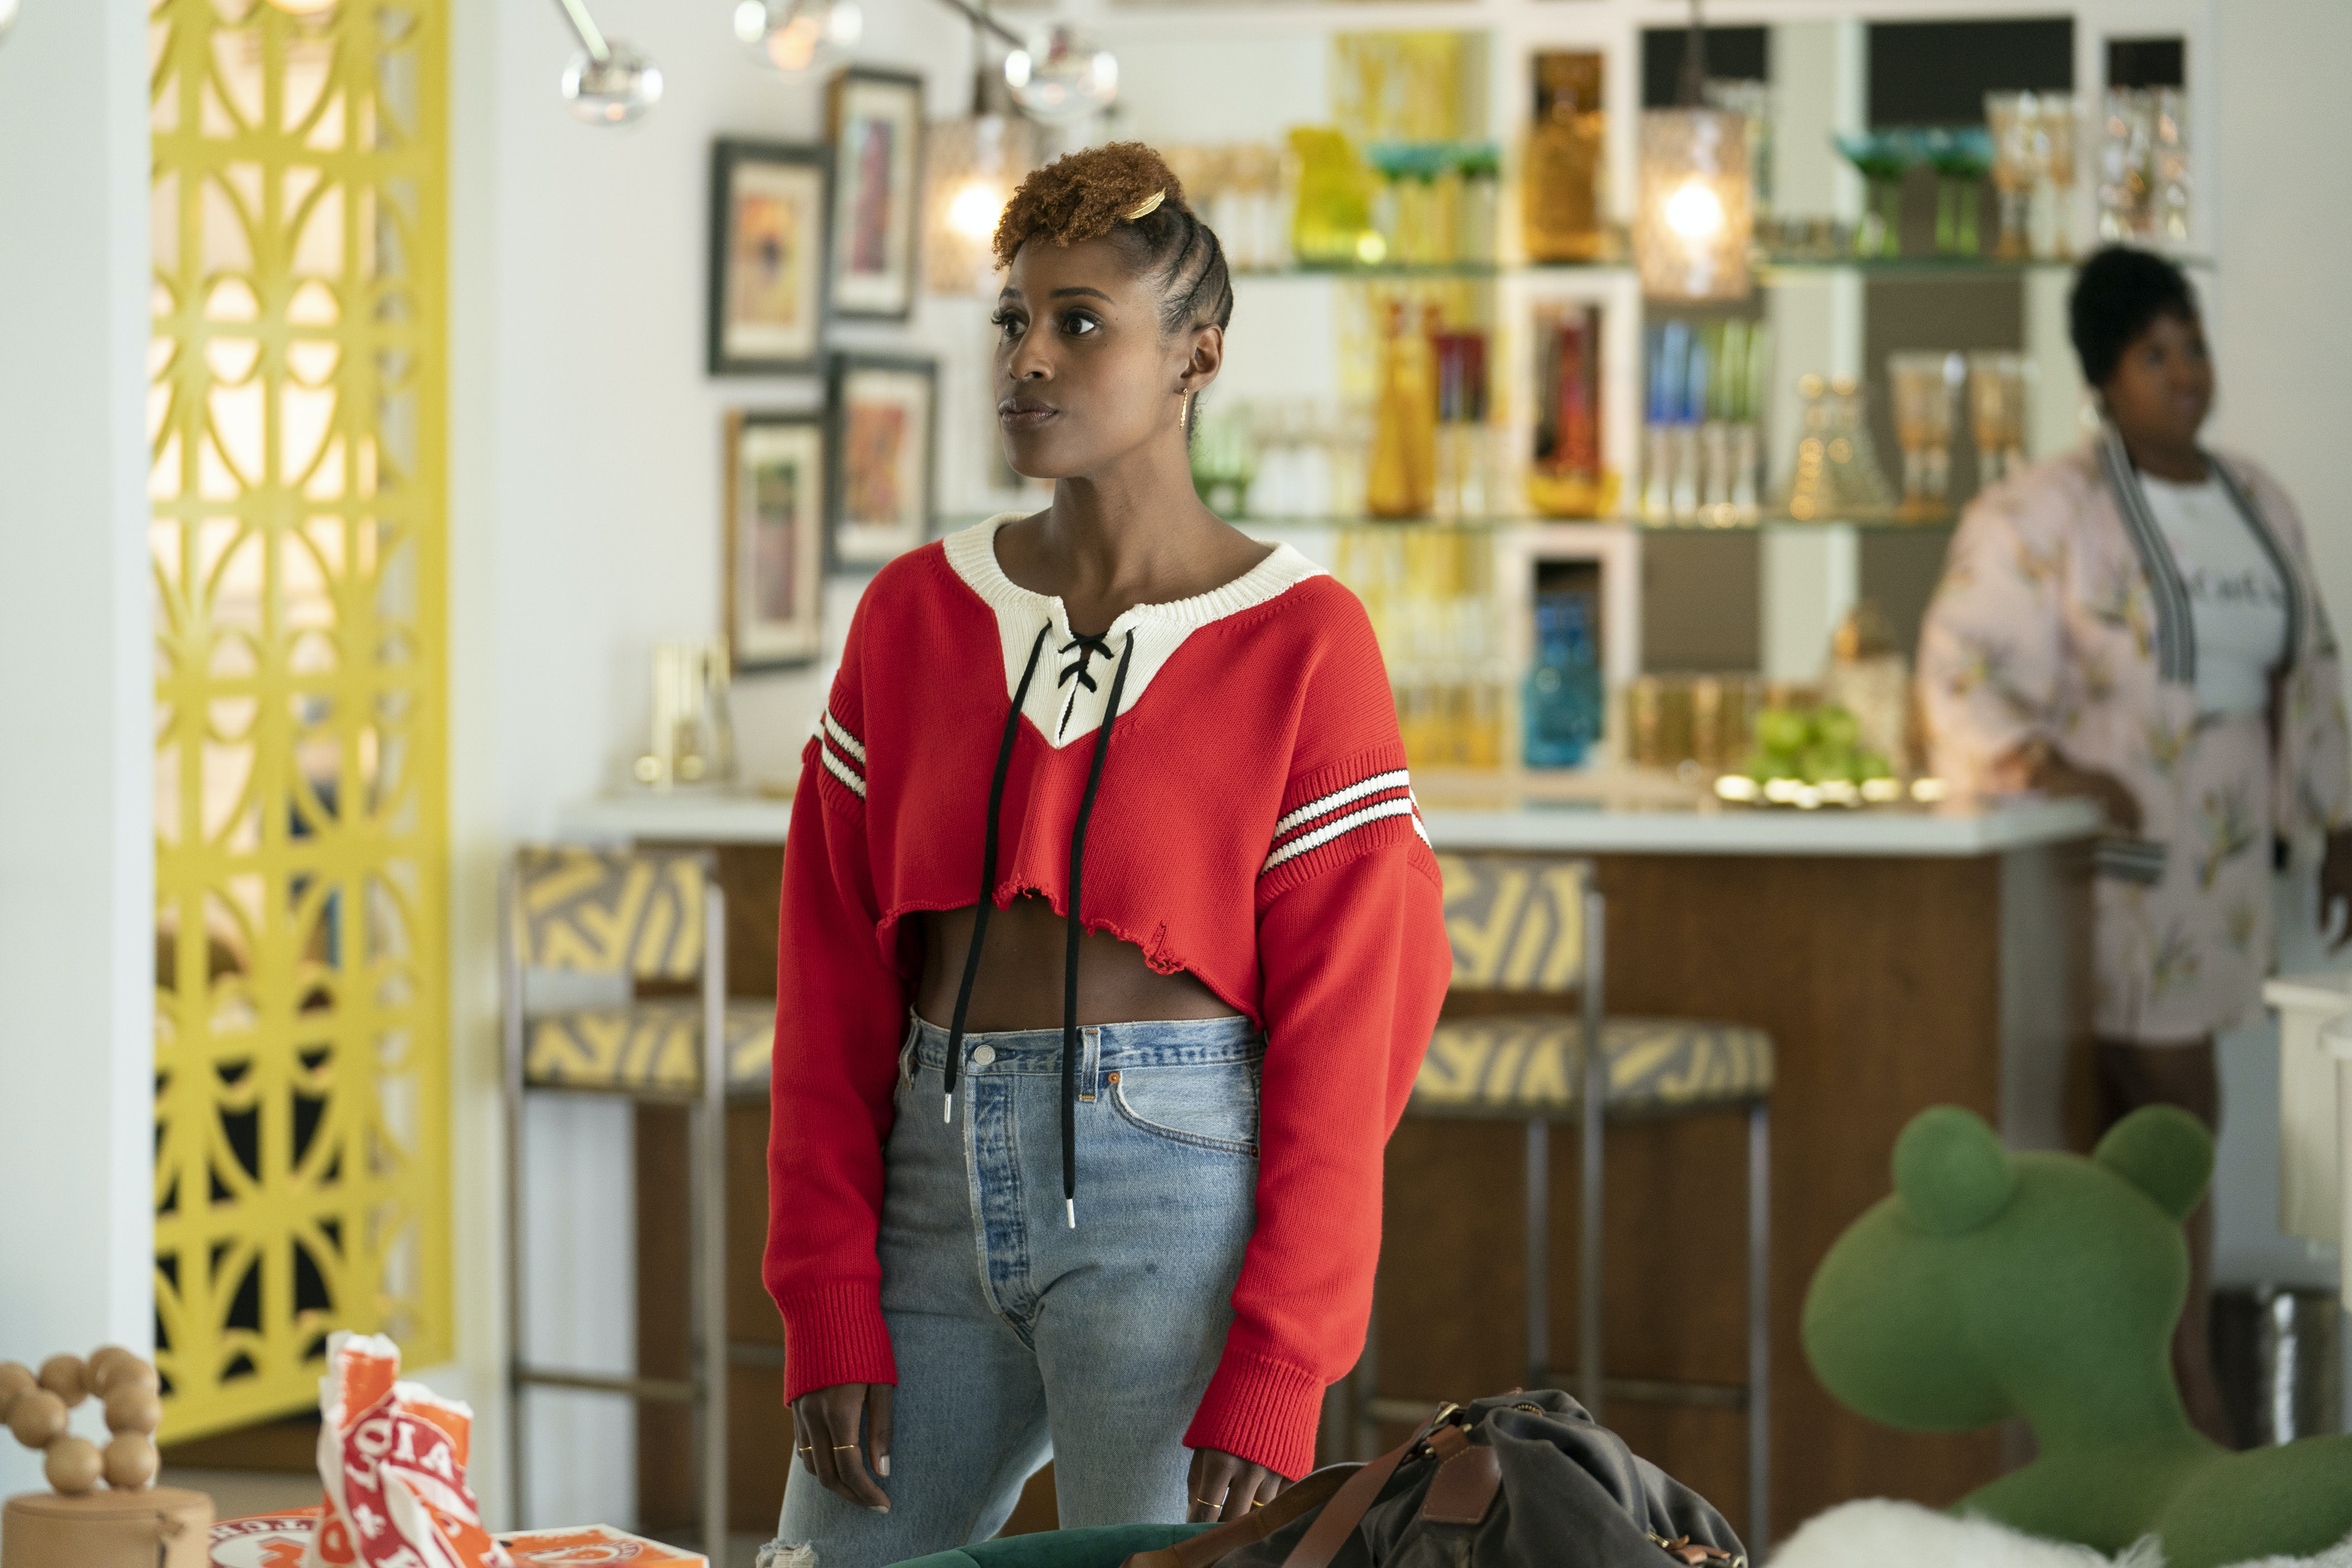 Insecure' Season 3, Episode 5 Recap: 'High-Like' - PureWow